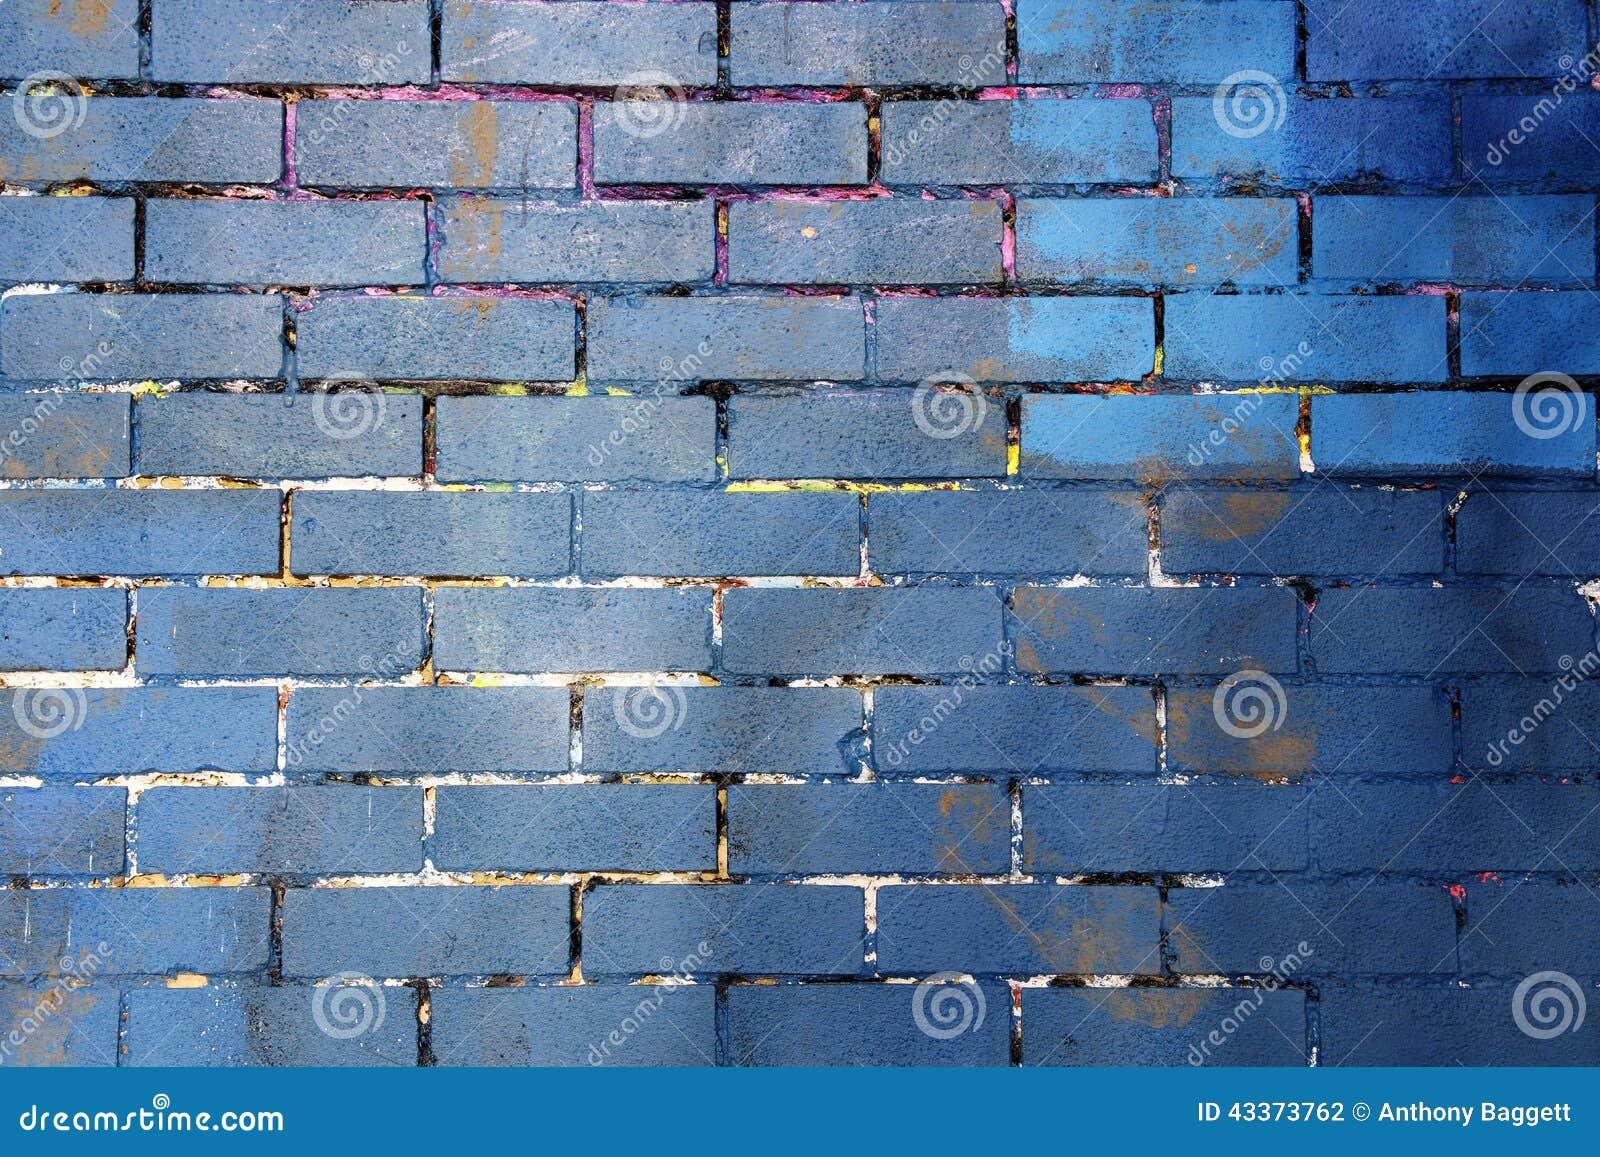 Purple Brick Wall Background Royalty Free Stock Photo